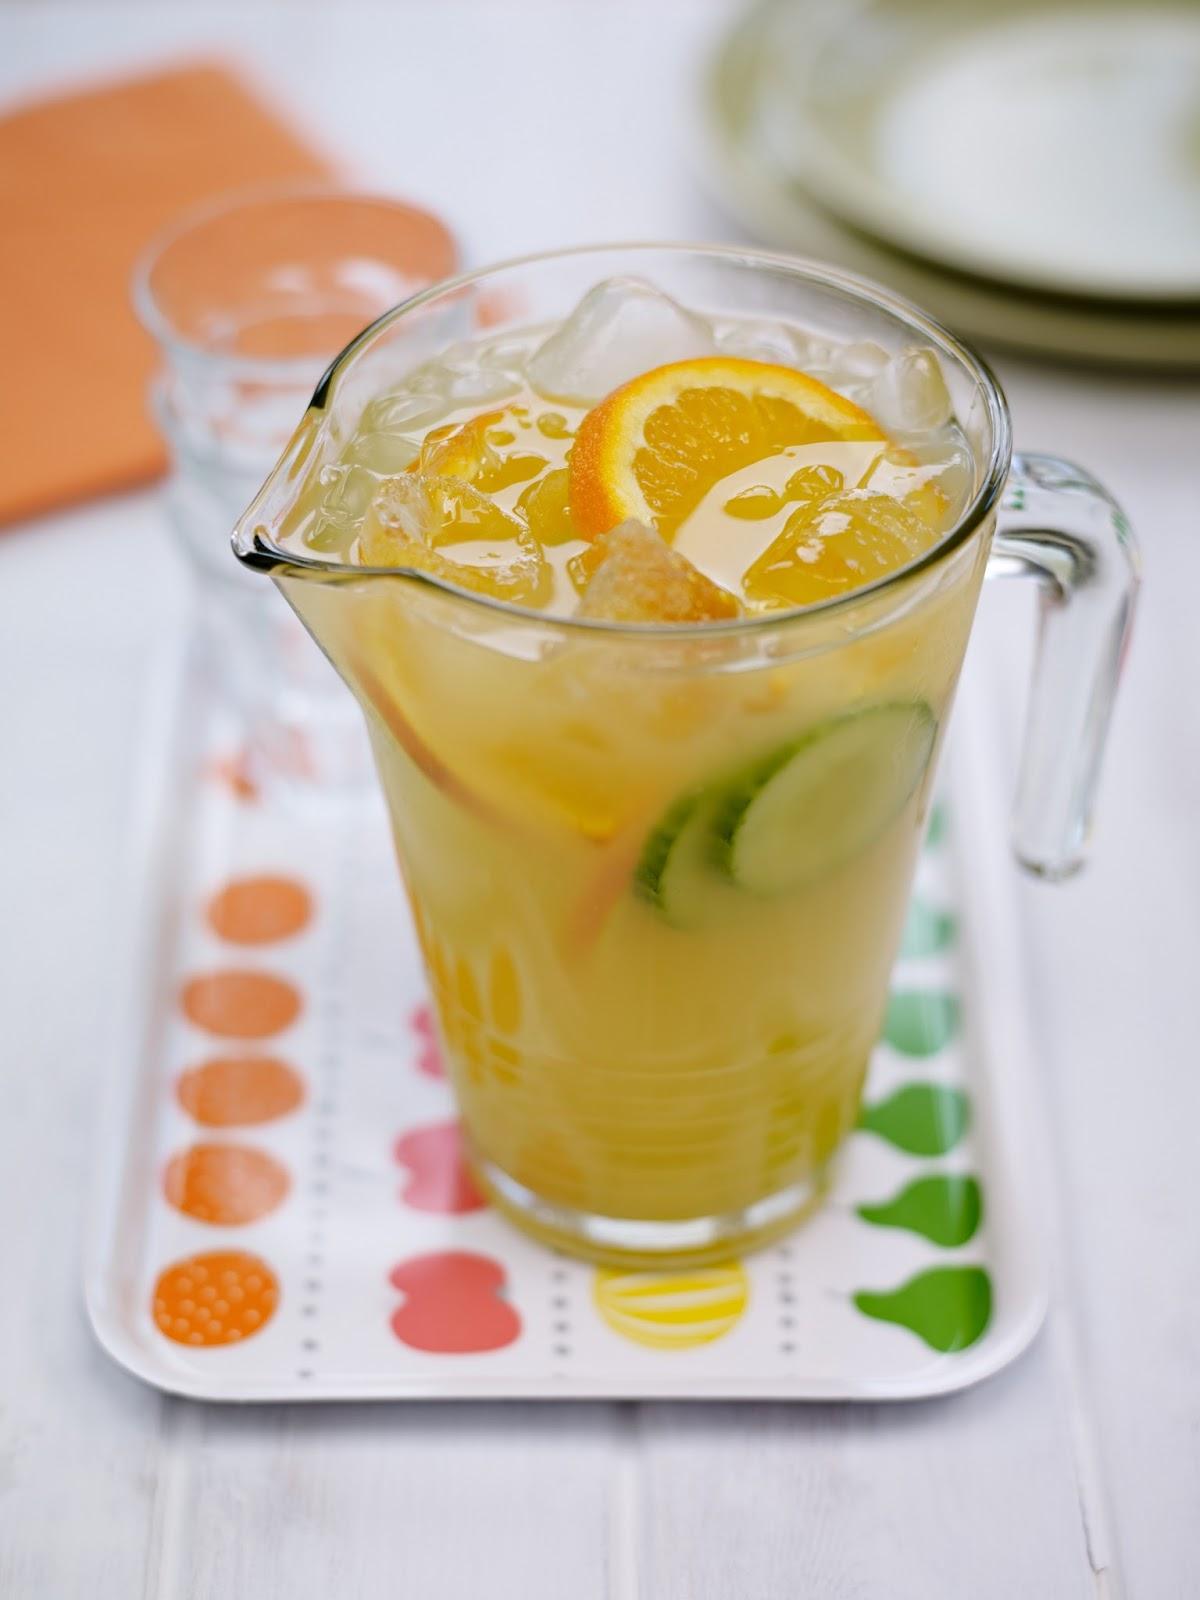 Joe's Wadsack's Fruity Cucumber Cooler